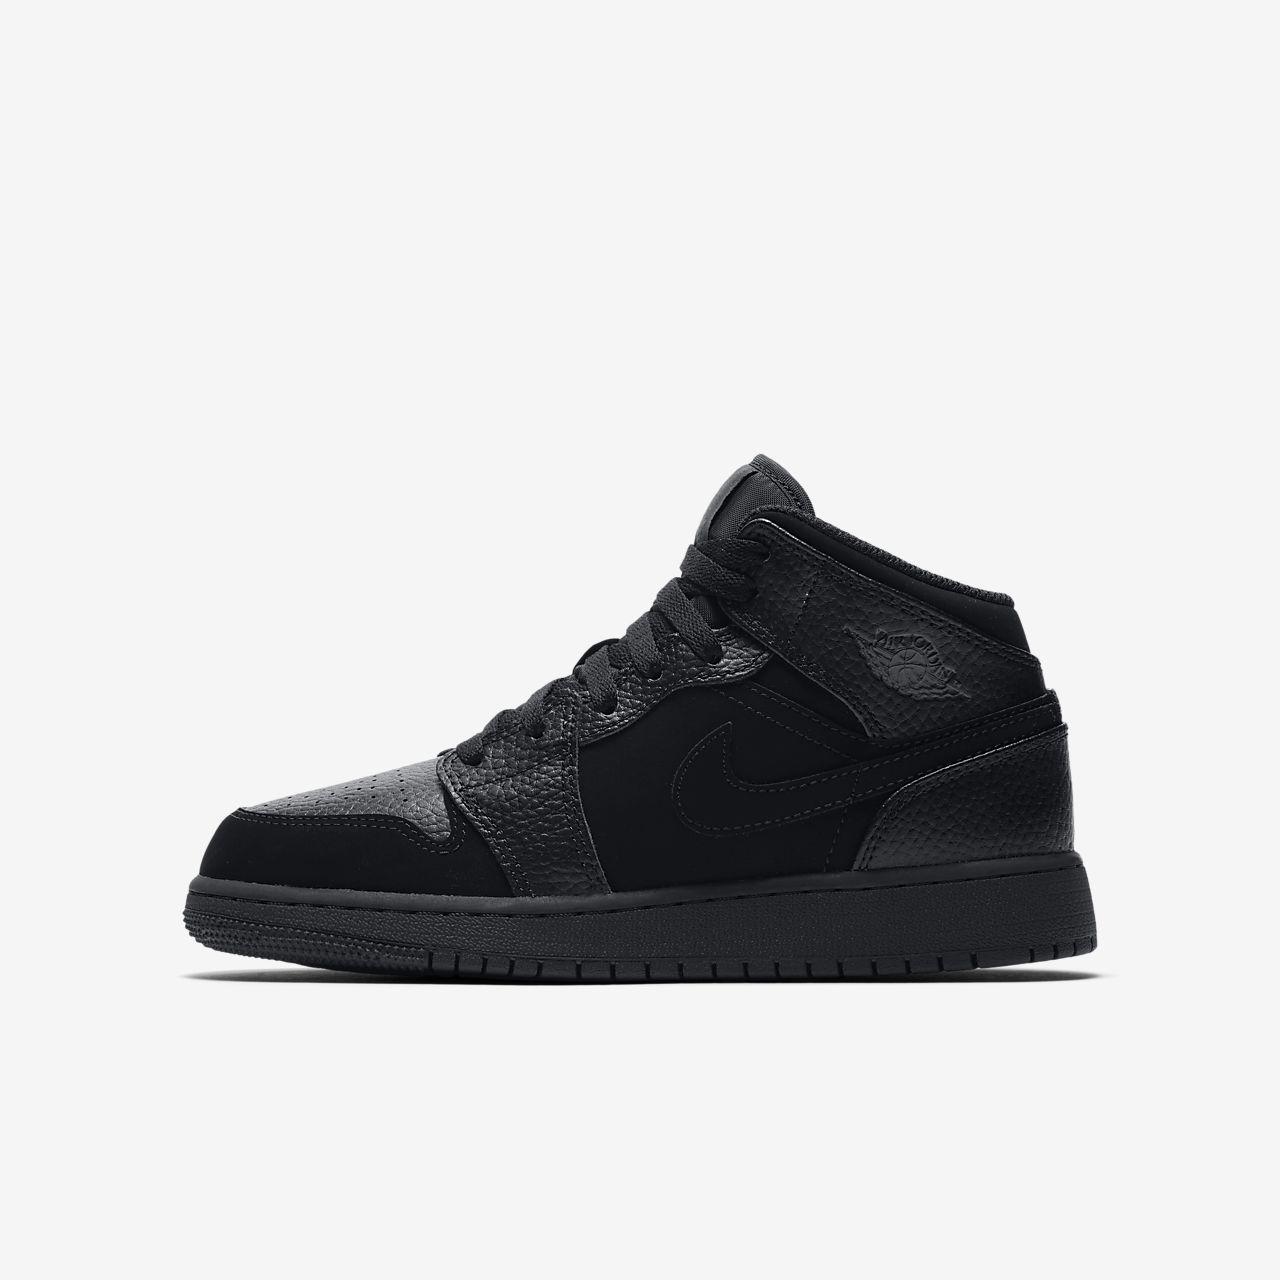 8710ada49d0c8 Scarpa Air Jordan 1 Mid - Ragazzi. Nike.com IT